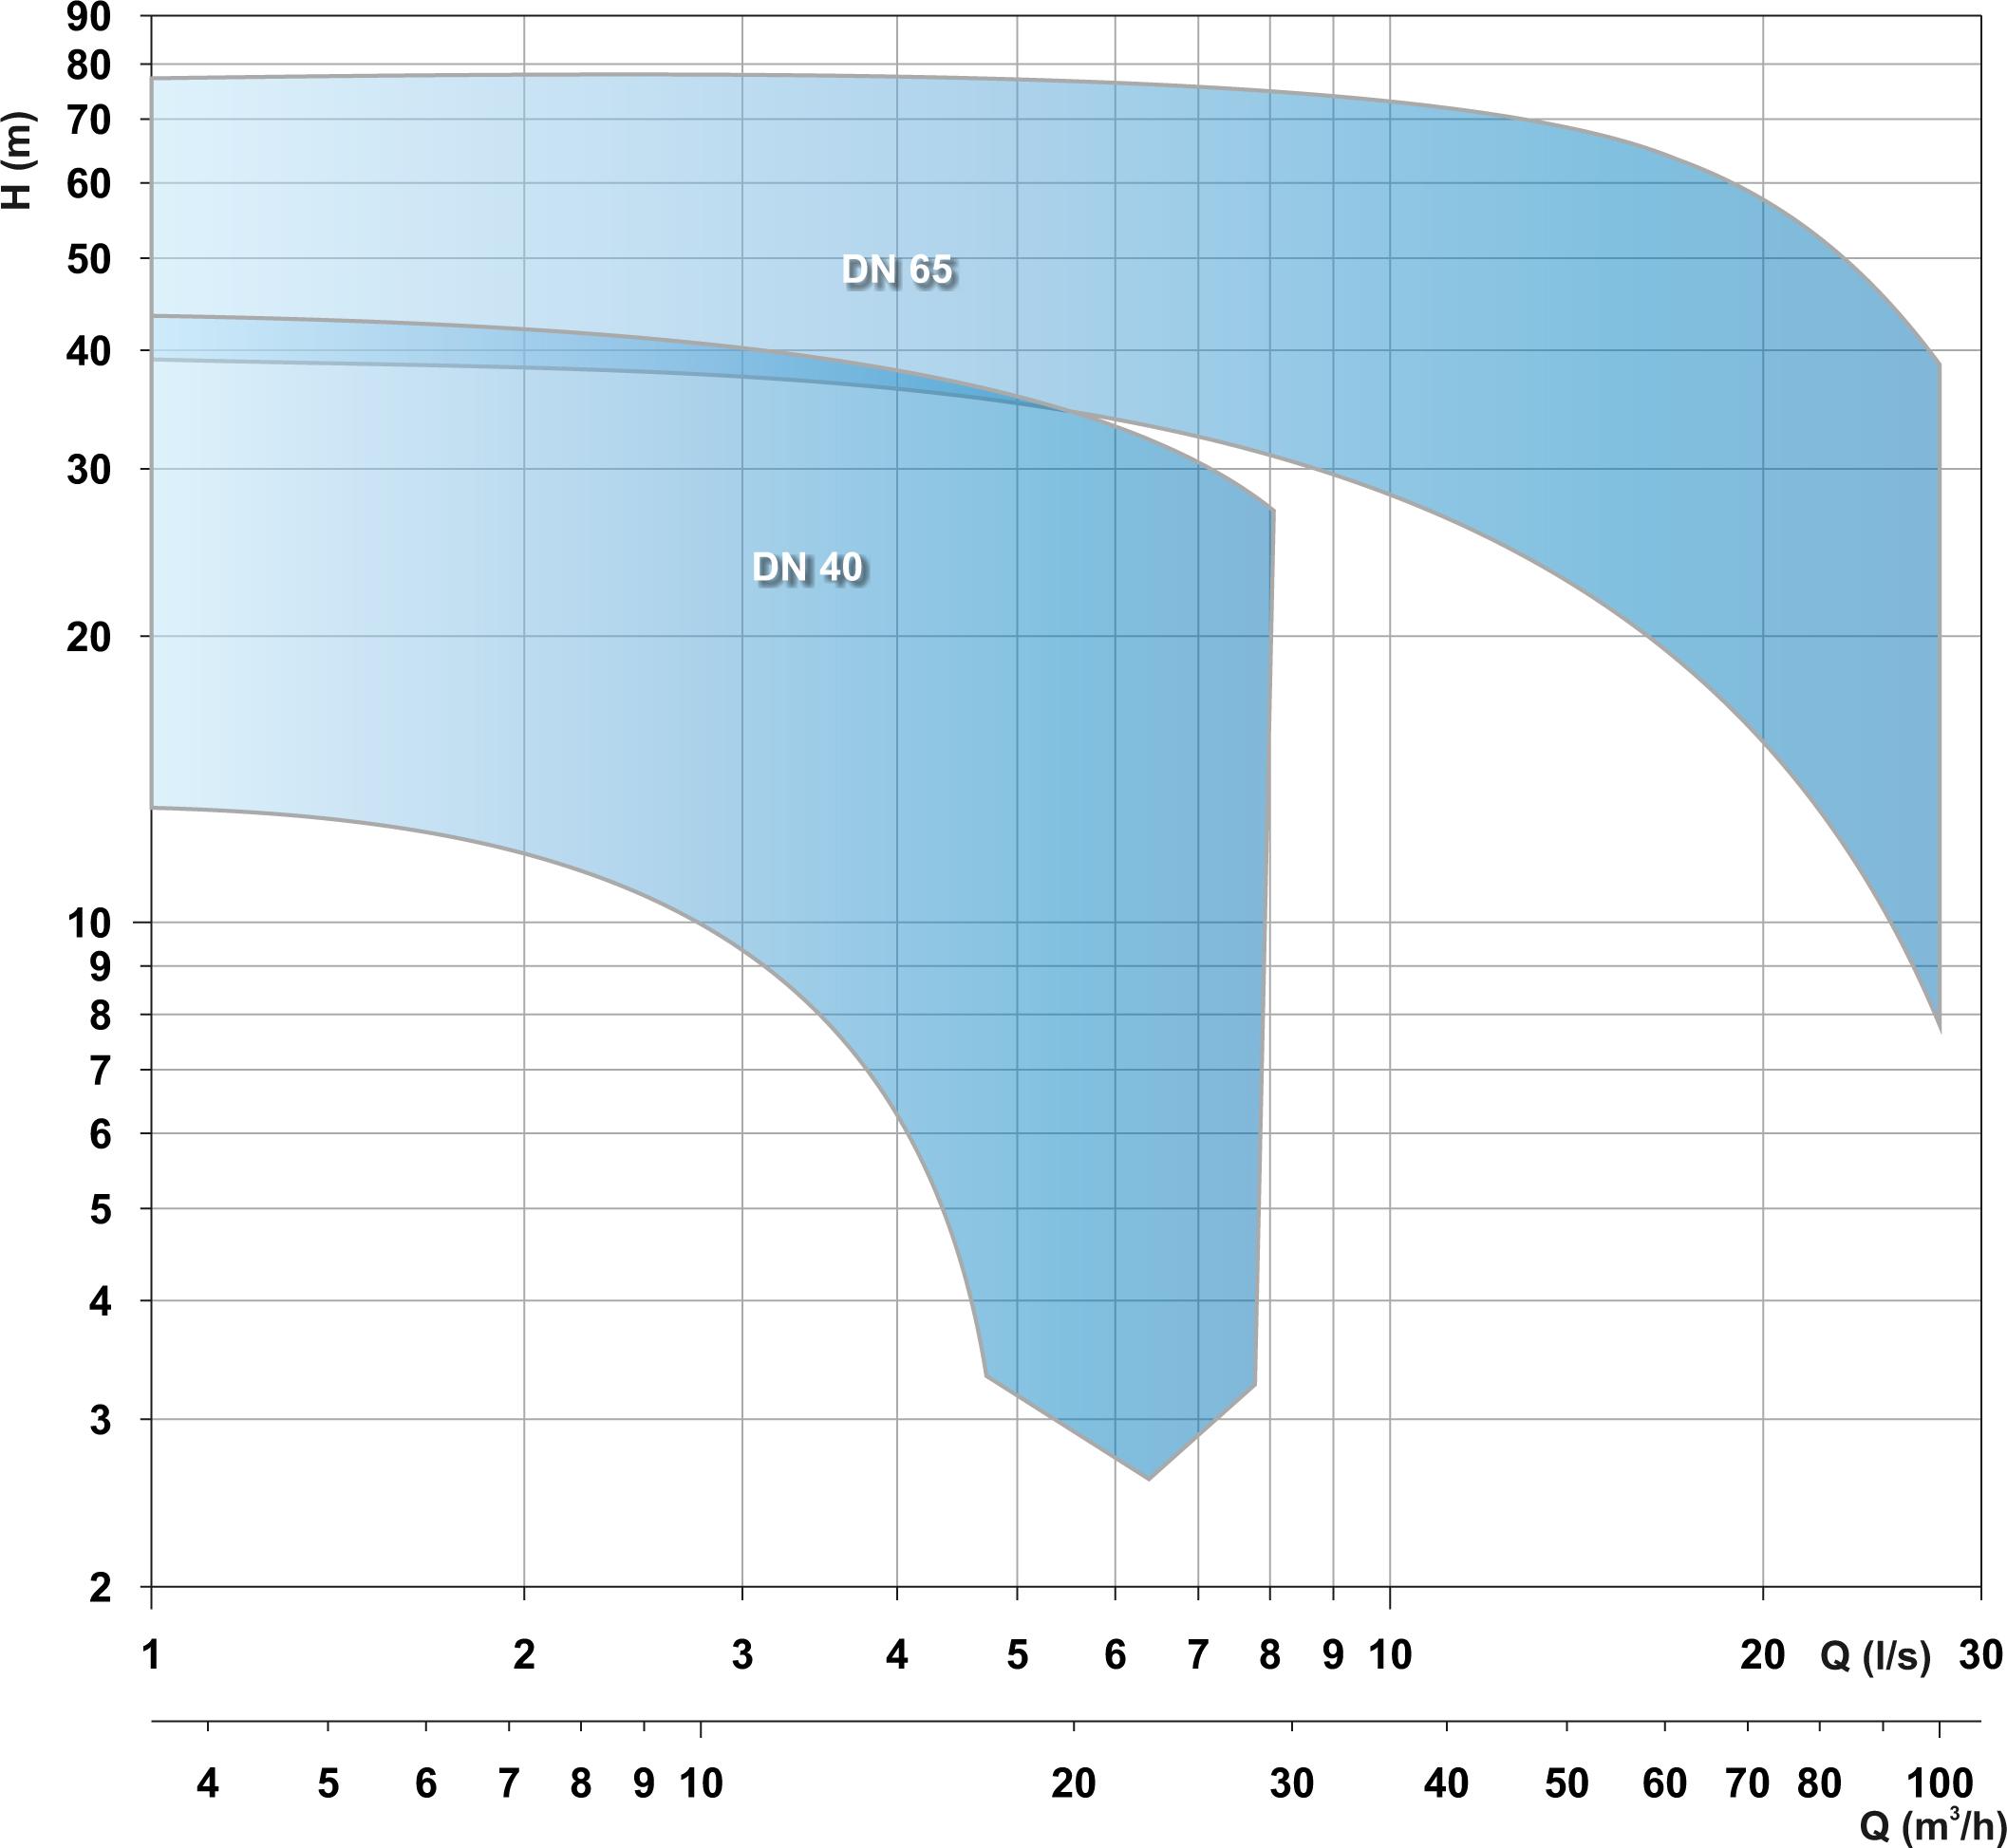 media/image/c8/aa/4c/D_Curve.jpg